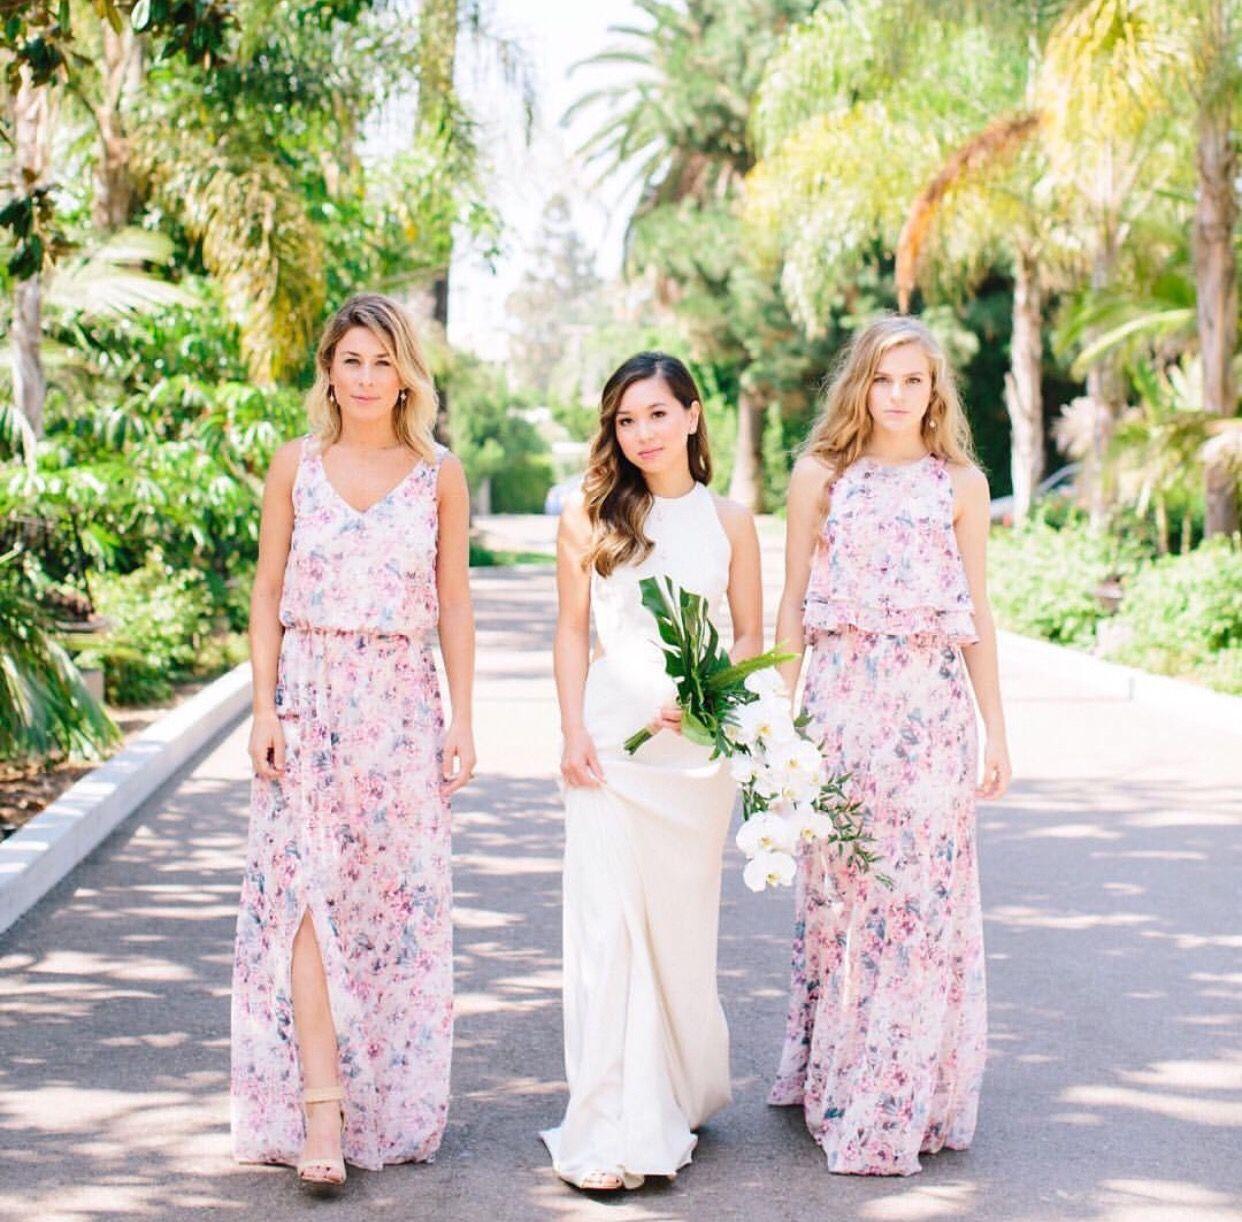 Kendall maxi dress green wedding shoes floral wedding shoes gws x showmeyourmumu bridesmaid dresses at a tropical wedding mirellecarmichaelphoto ombrellifo Gallery